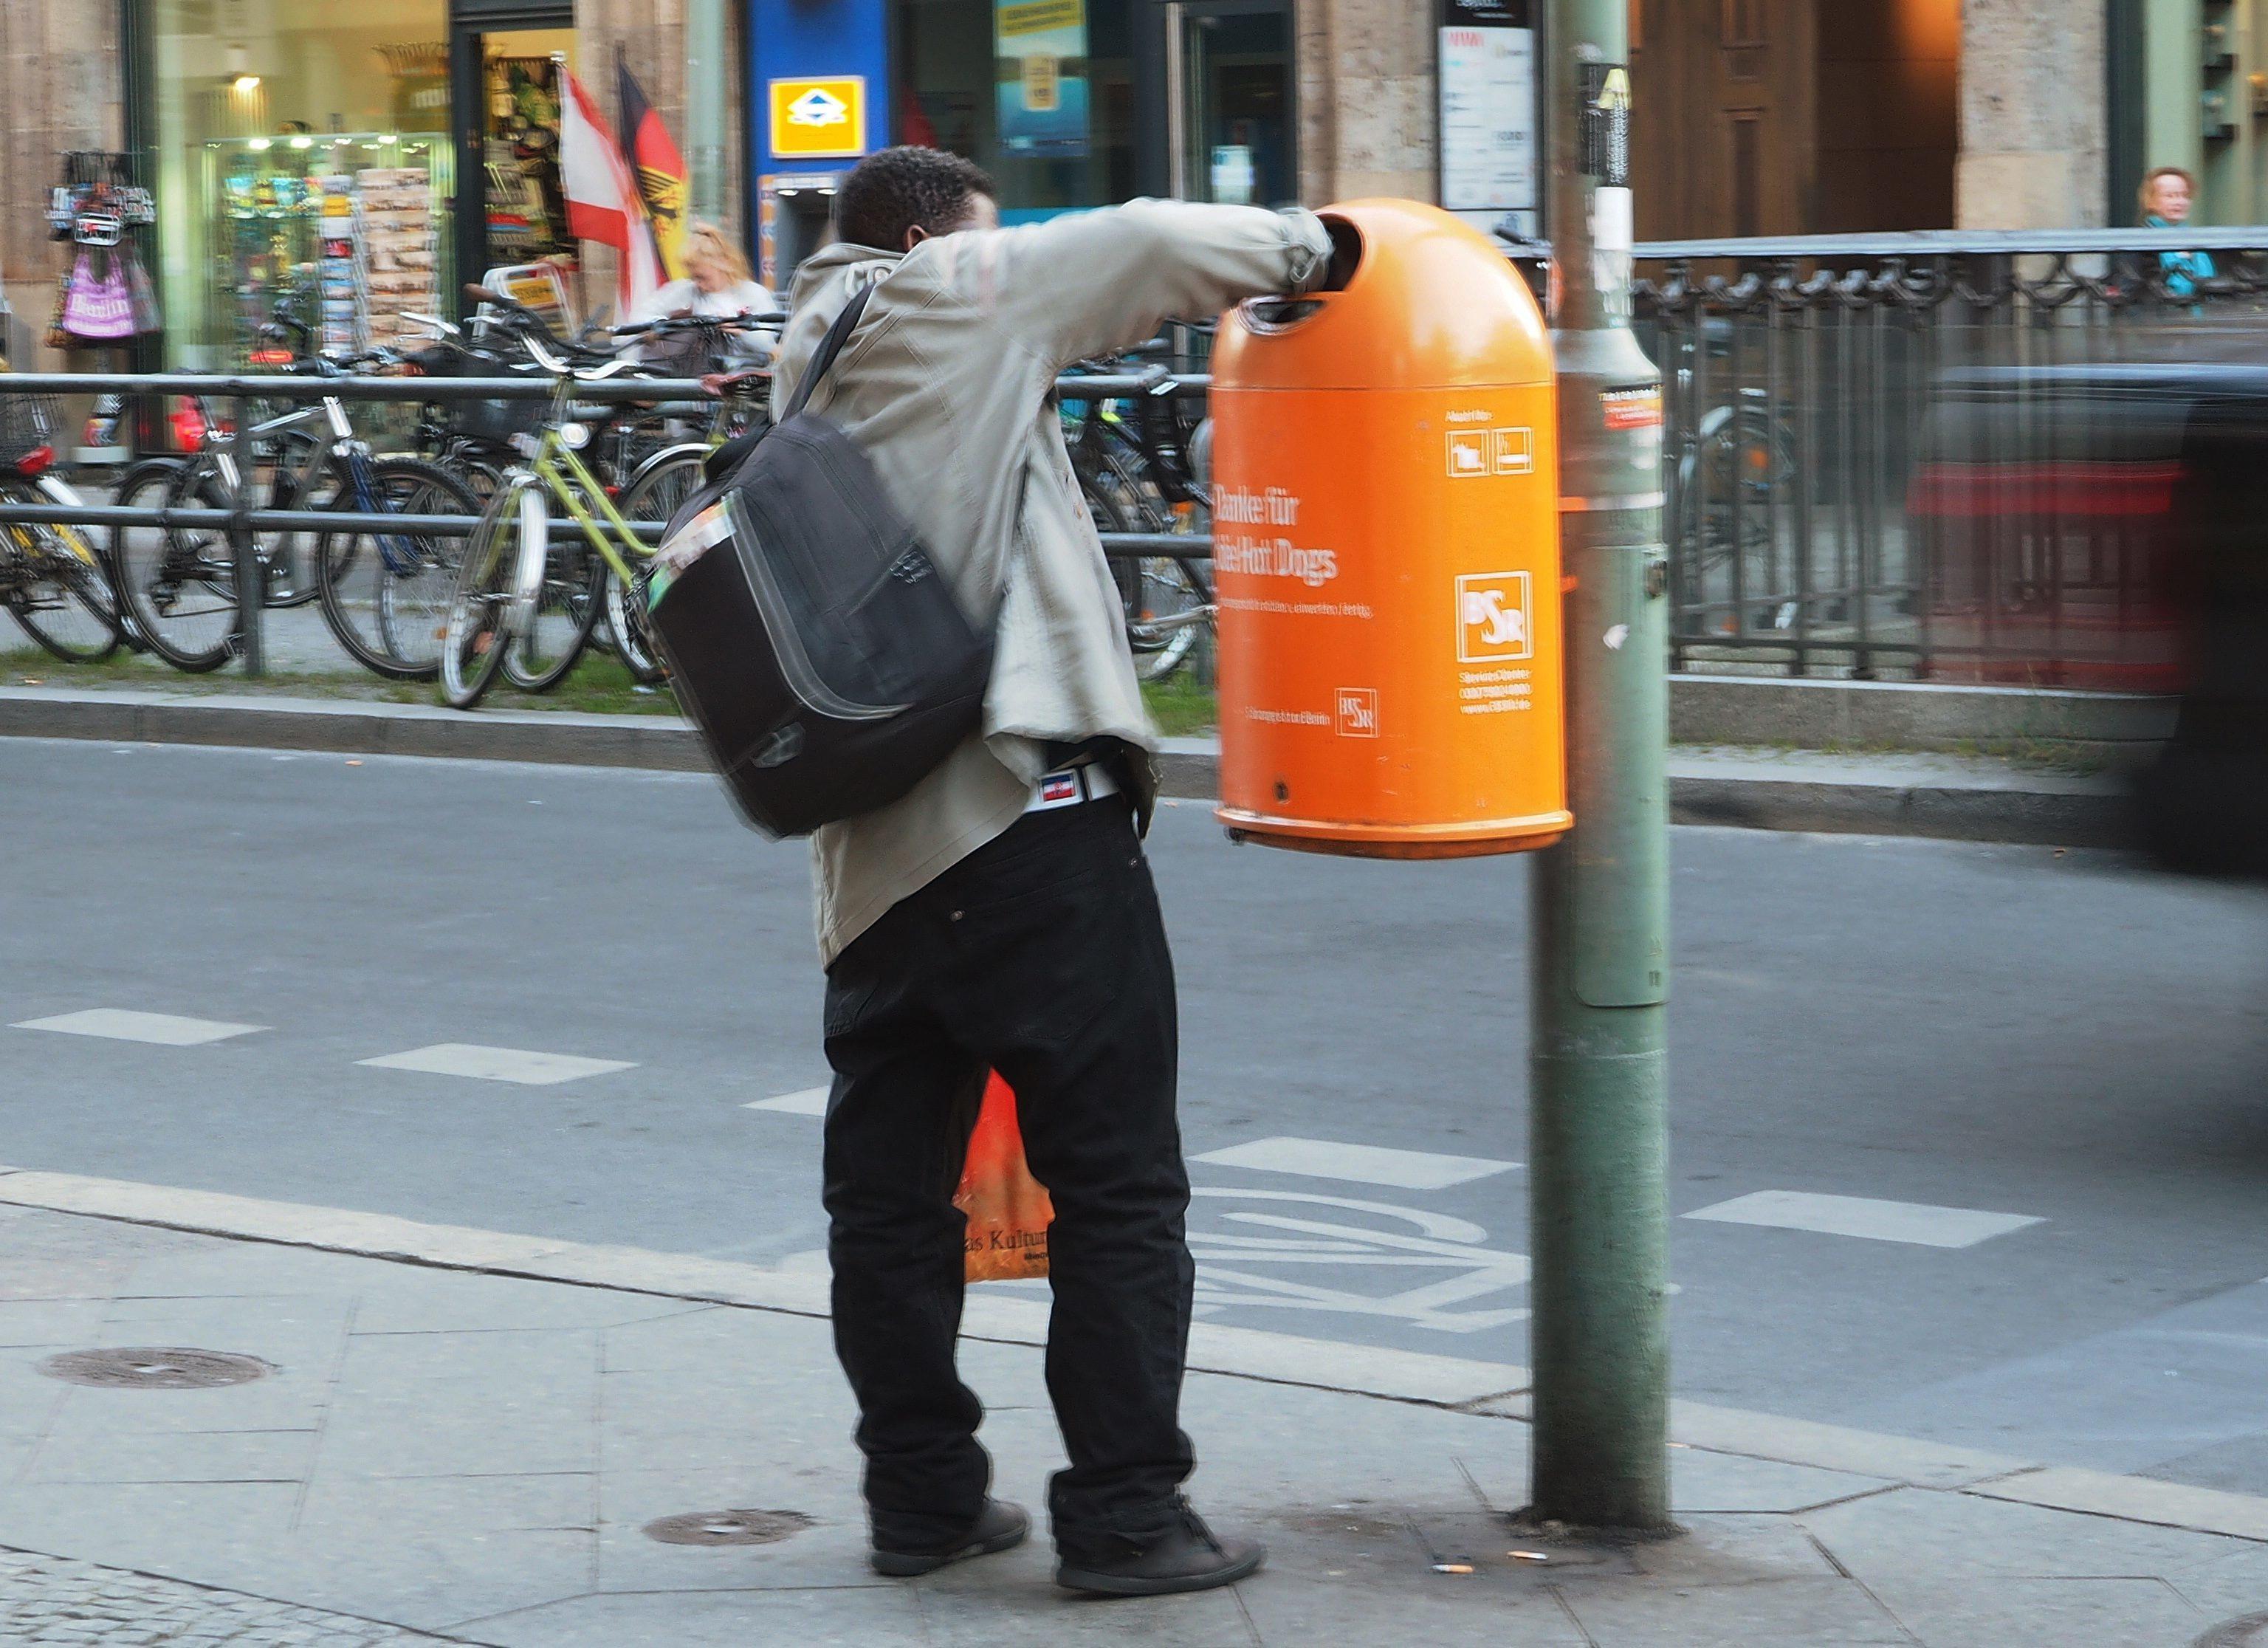 Berlin: Getränkemarkt Lehmann will Flaschensammler vertreiben | STERN.de